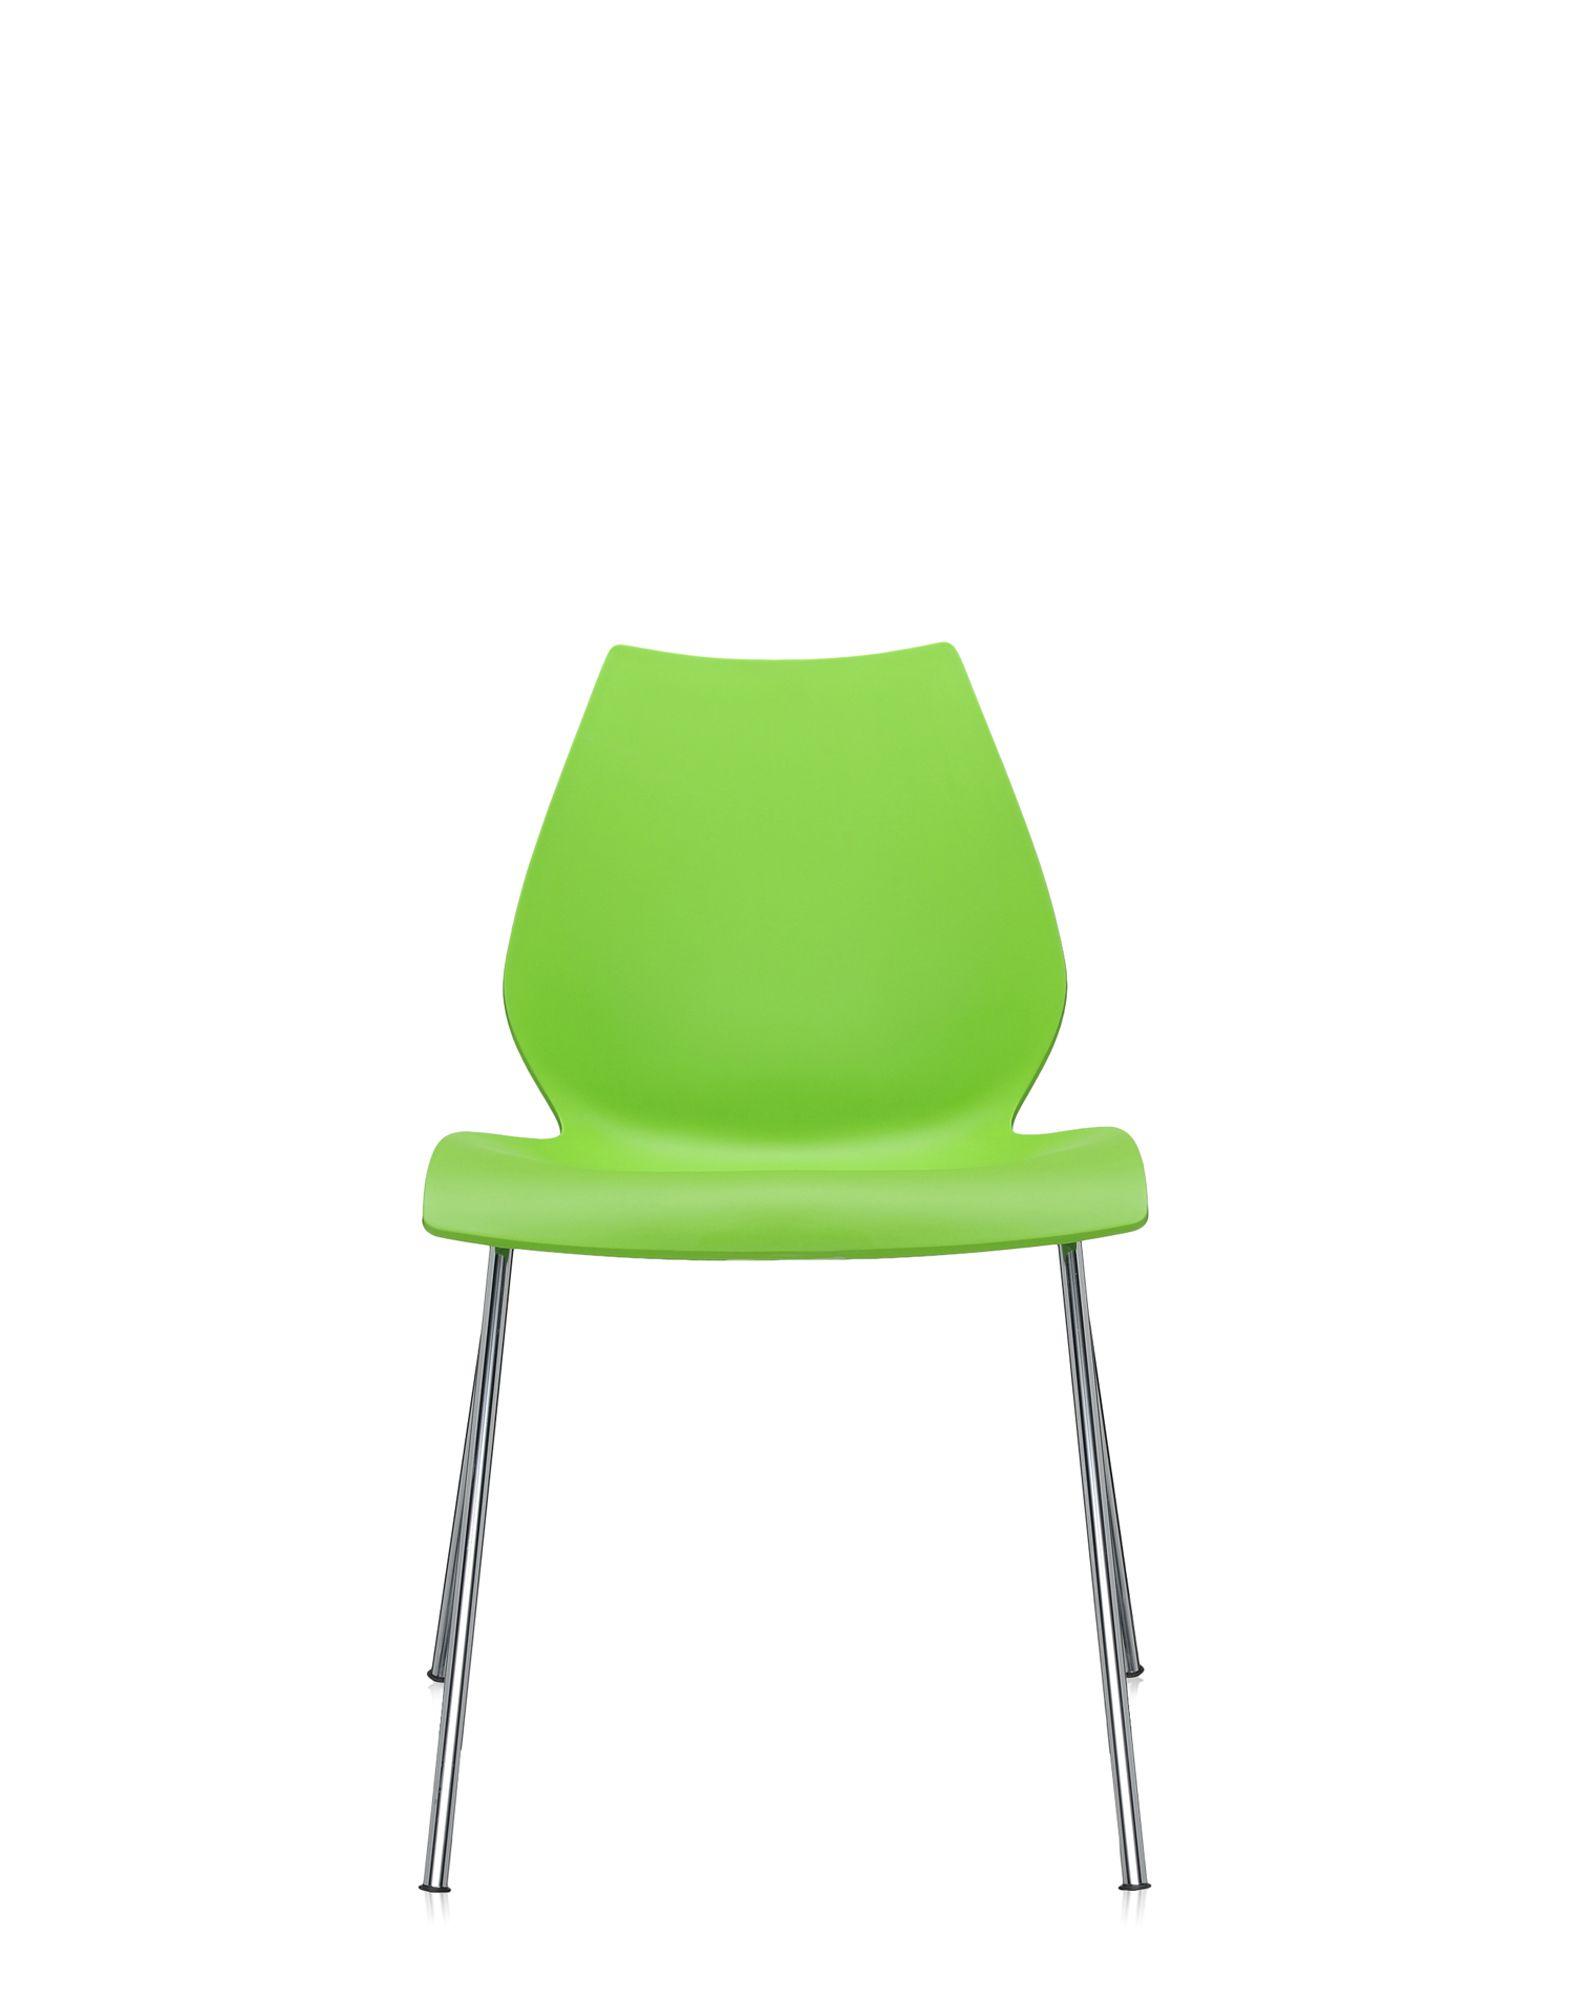 Kartell Catalogo Prodotti : Kartell maui verde menta sedie design newformsdesign